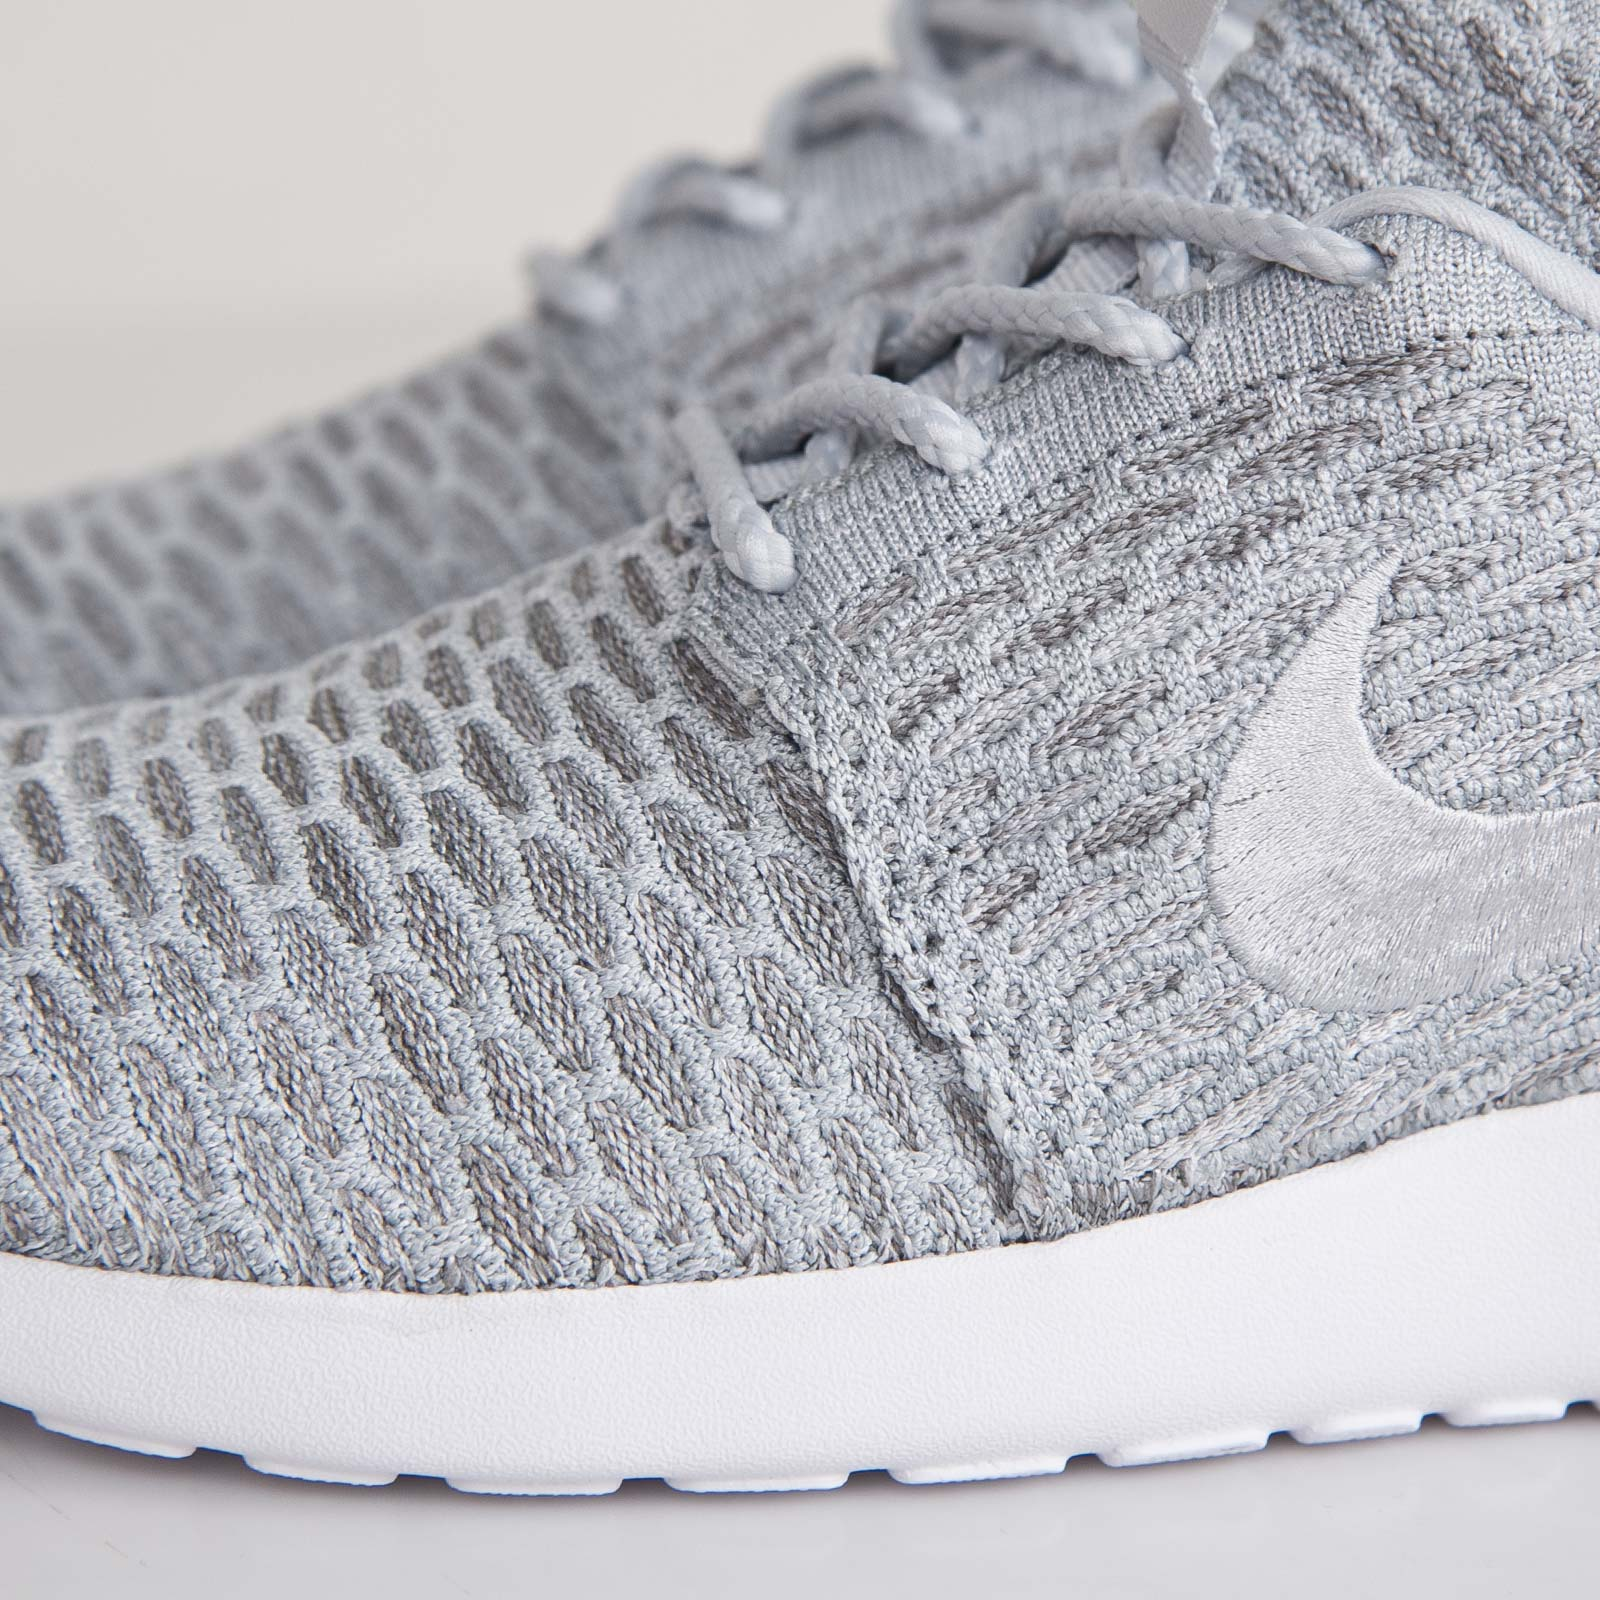 f32d208f94830 Nike Wmns Roshe Run Flyknit - 704927-002 - Sneakersnstuff